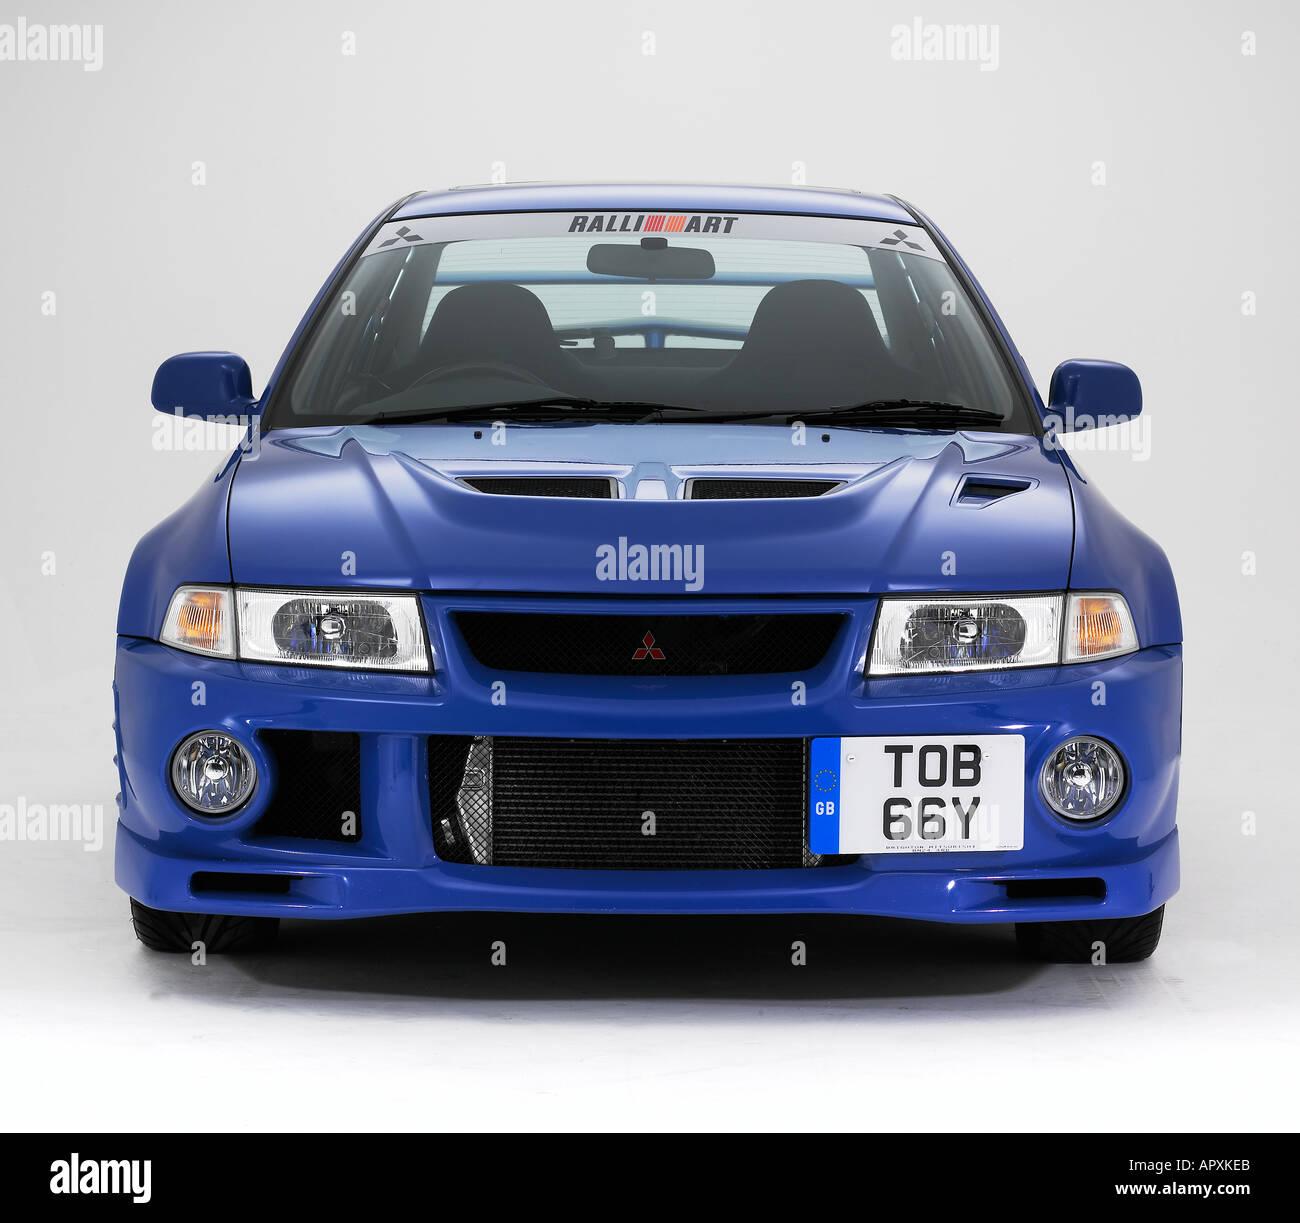 Mitsubishi Evo 6 Stock Photos & Mitsubishi Evo 6 Stock Images - Alamy